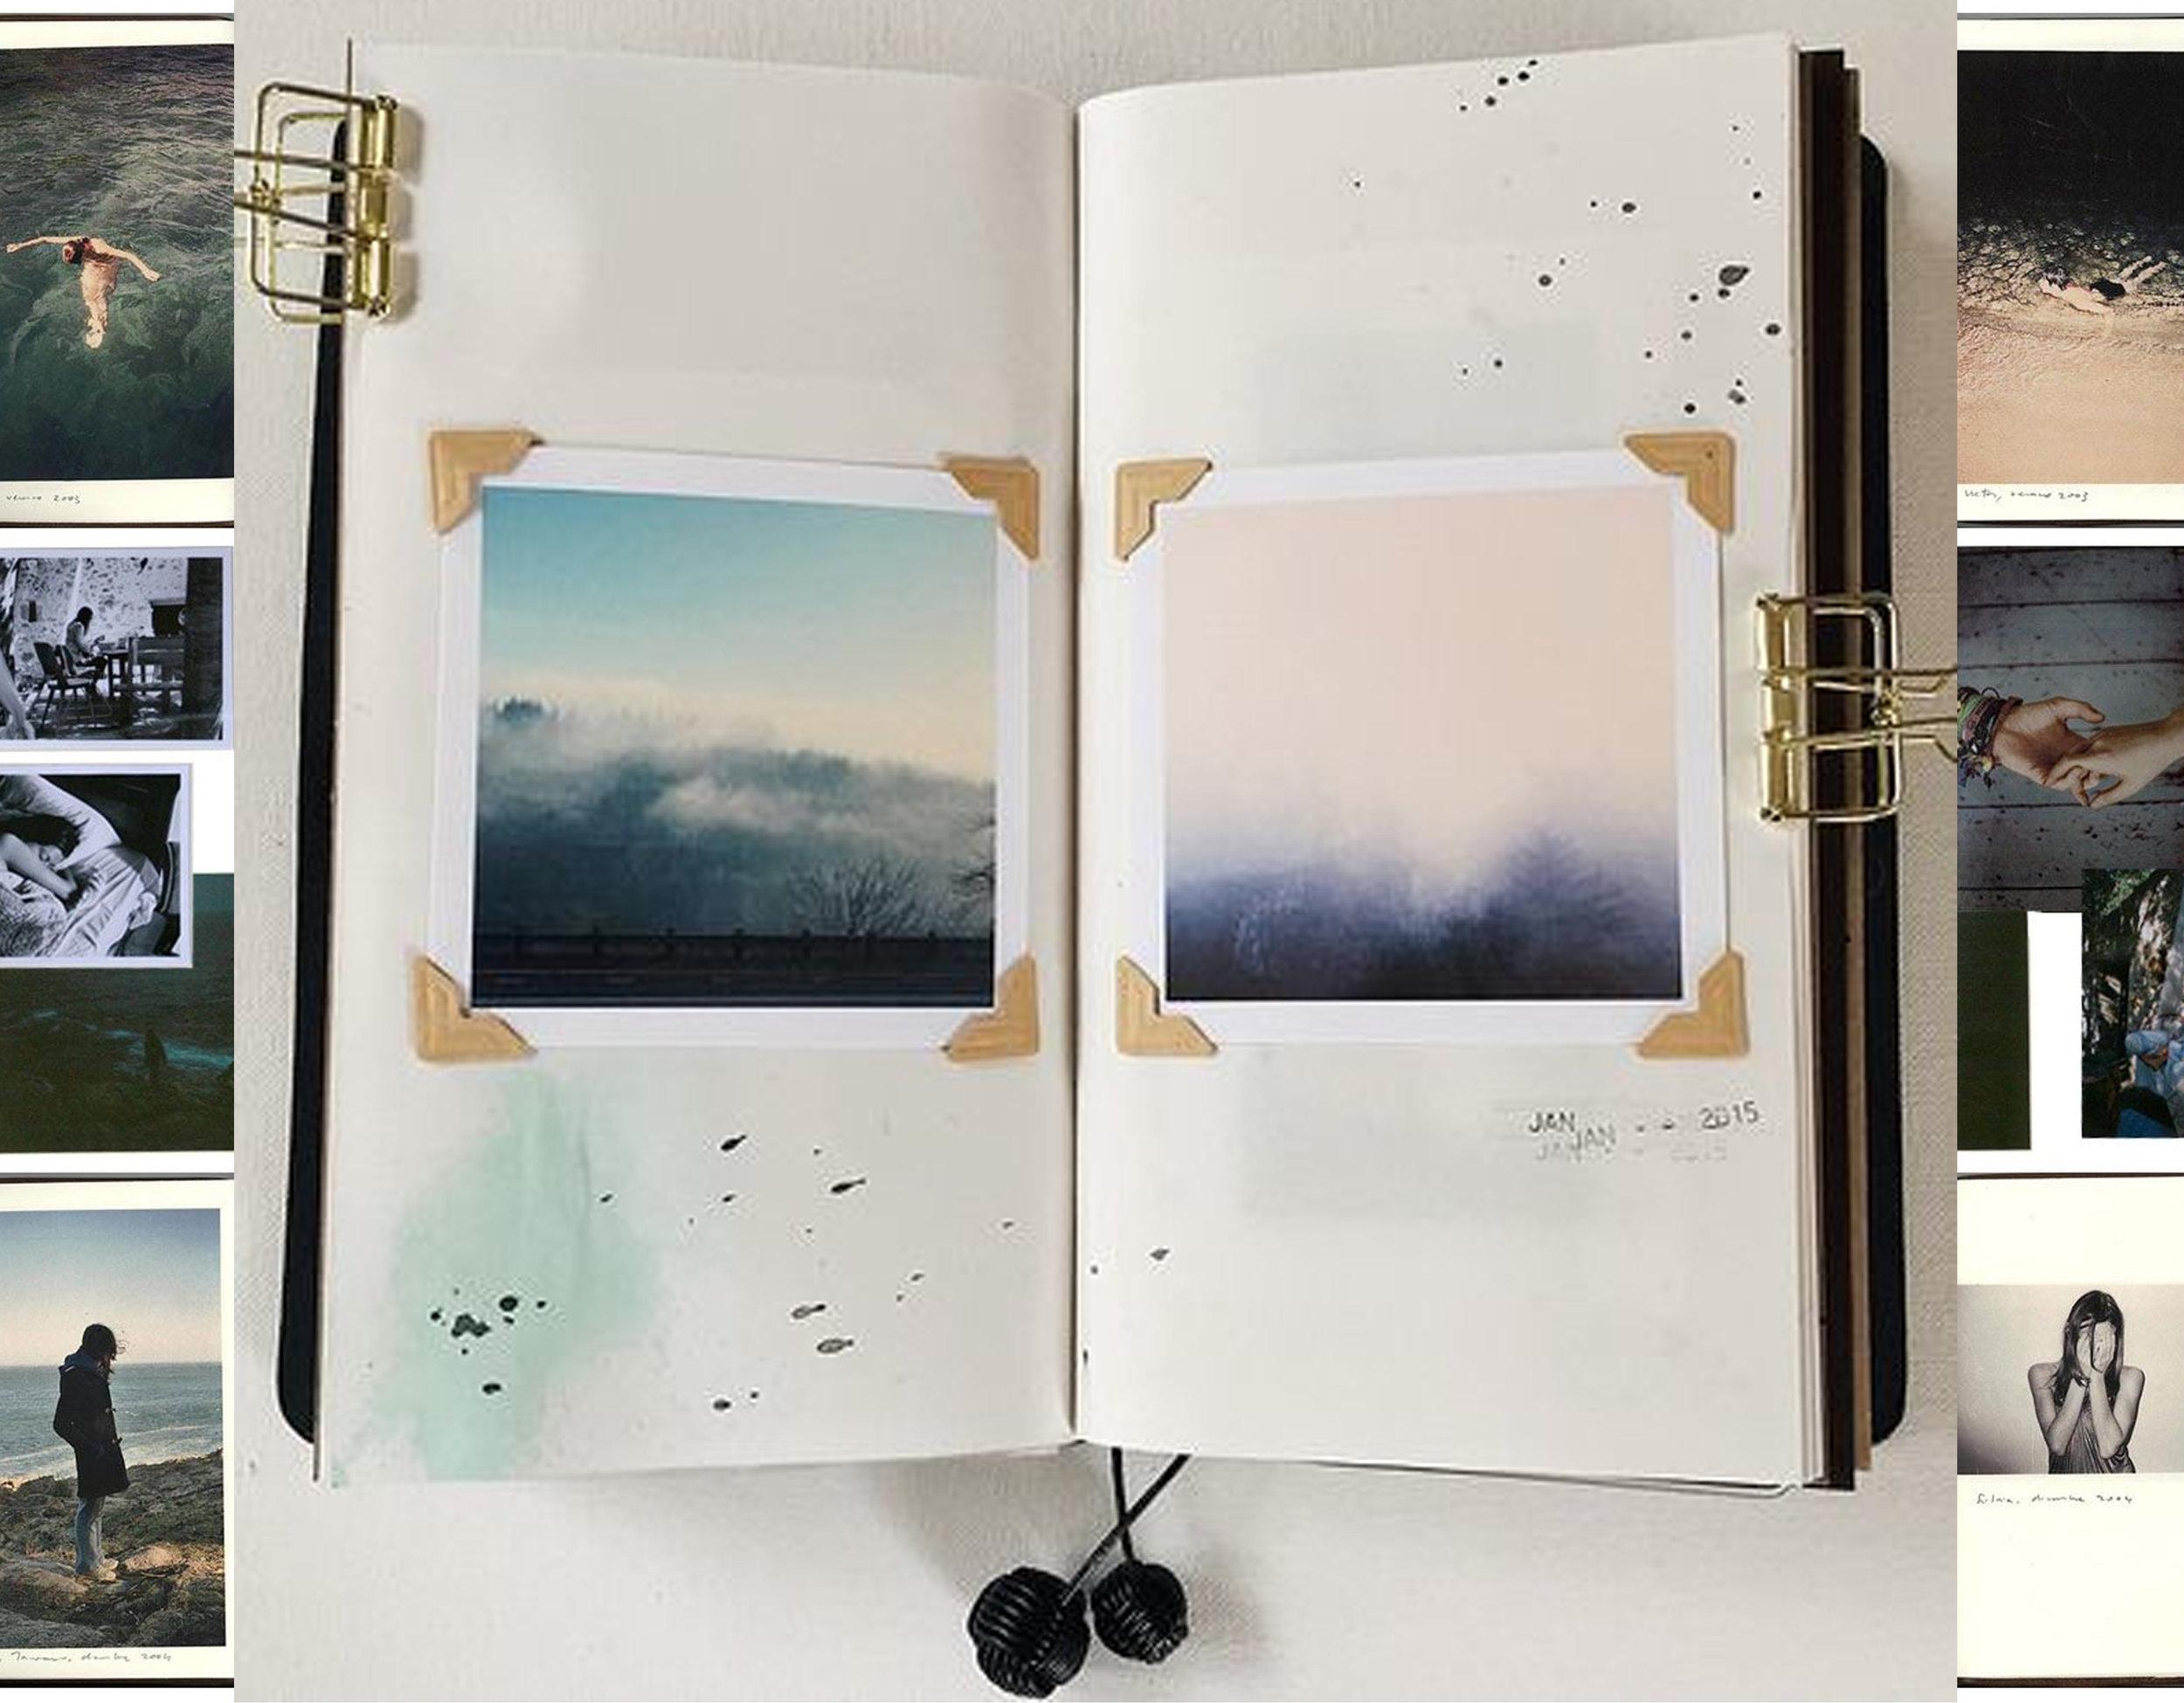 images via  Aubrey Road  - traveler's notebook via  Flickr